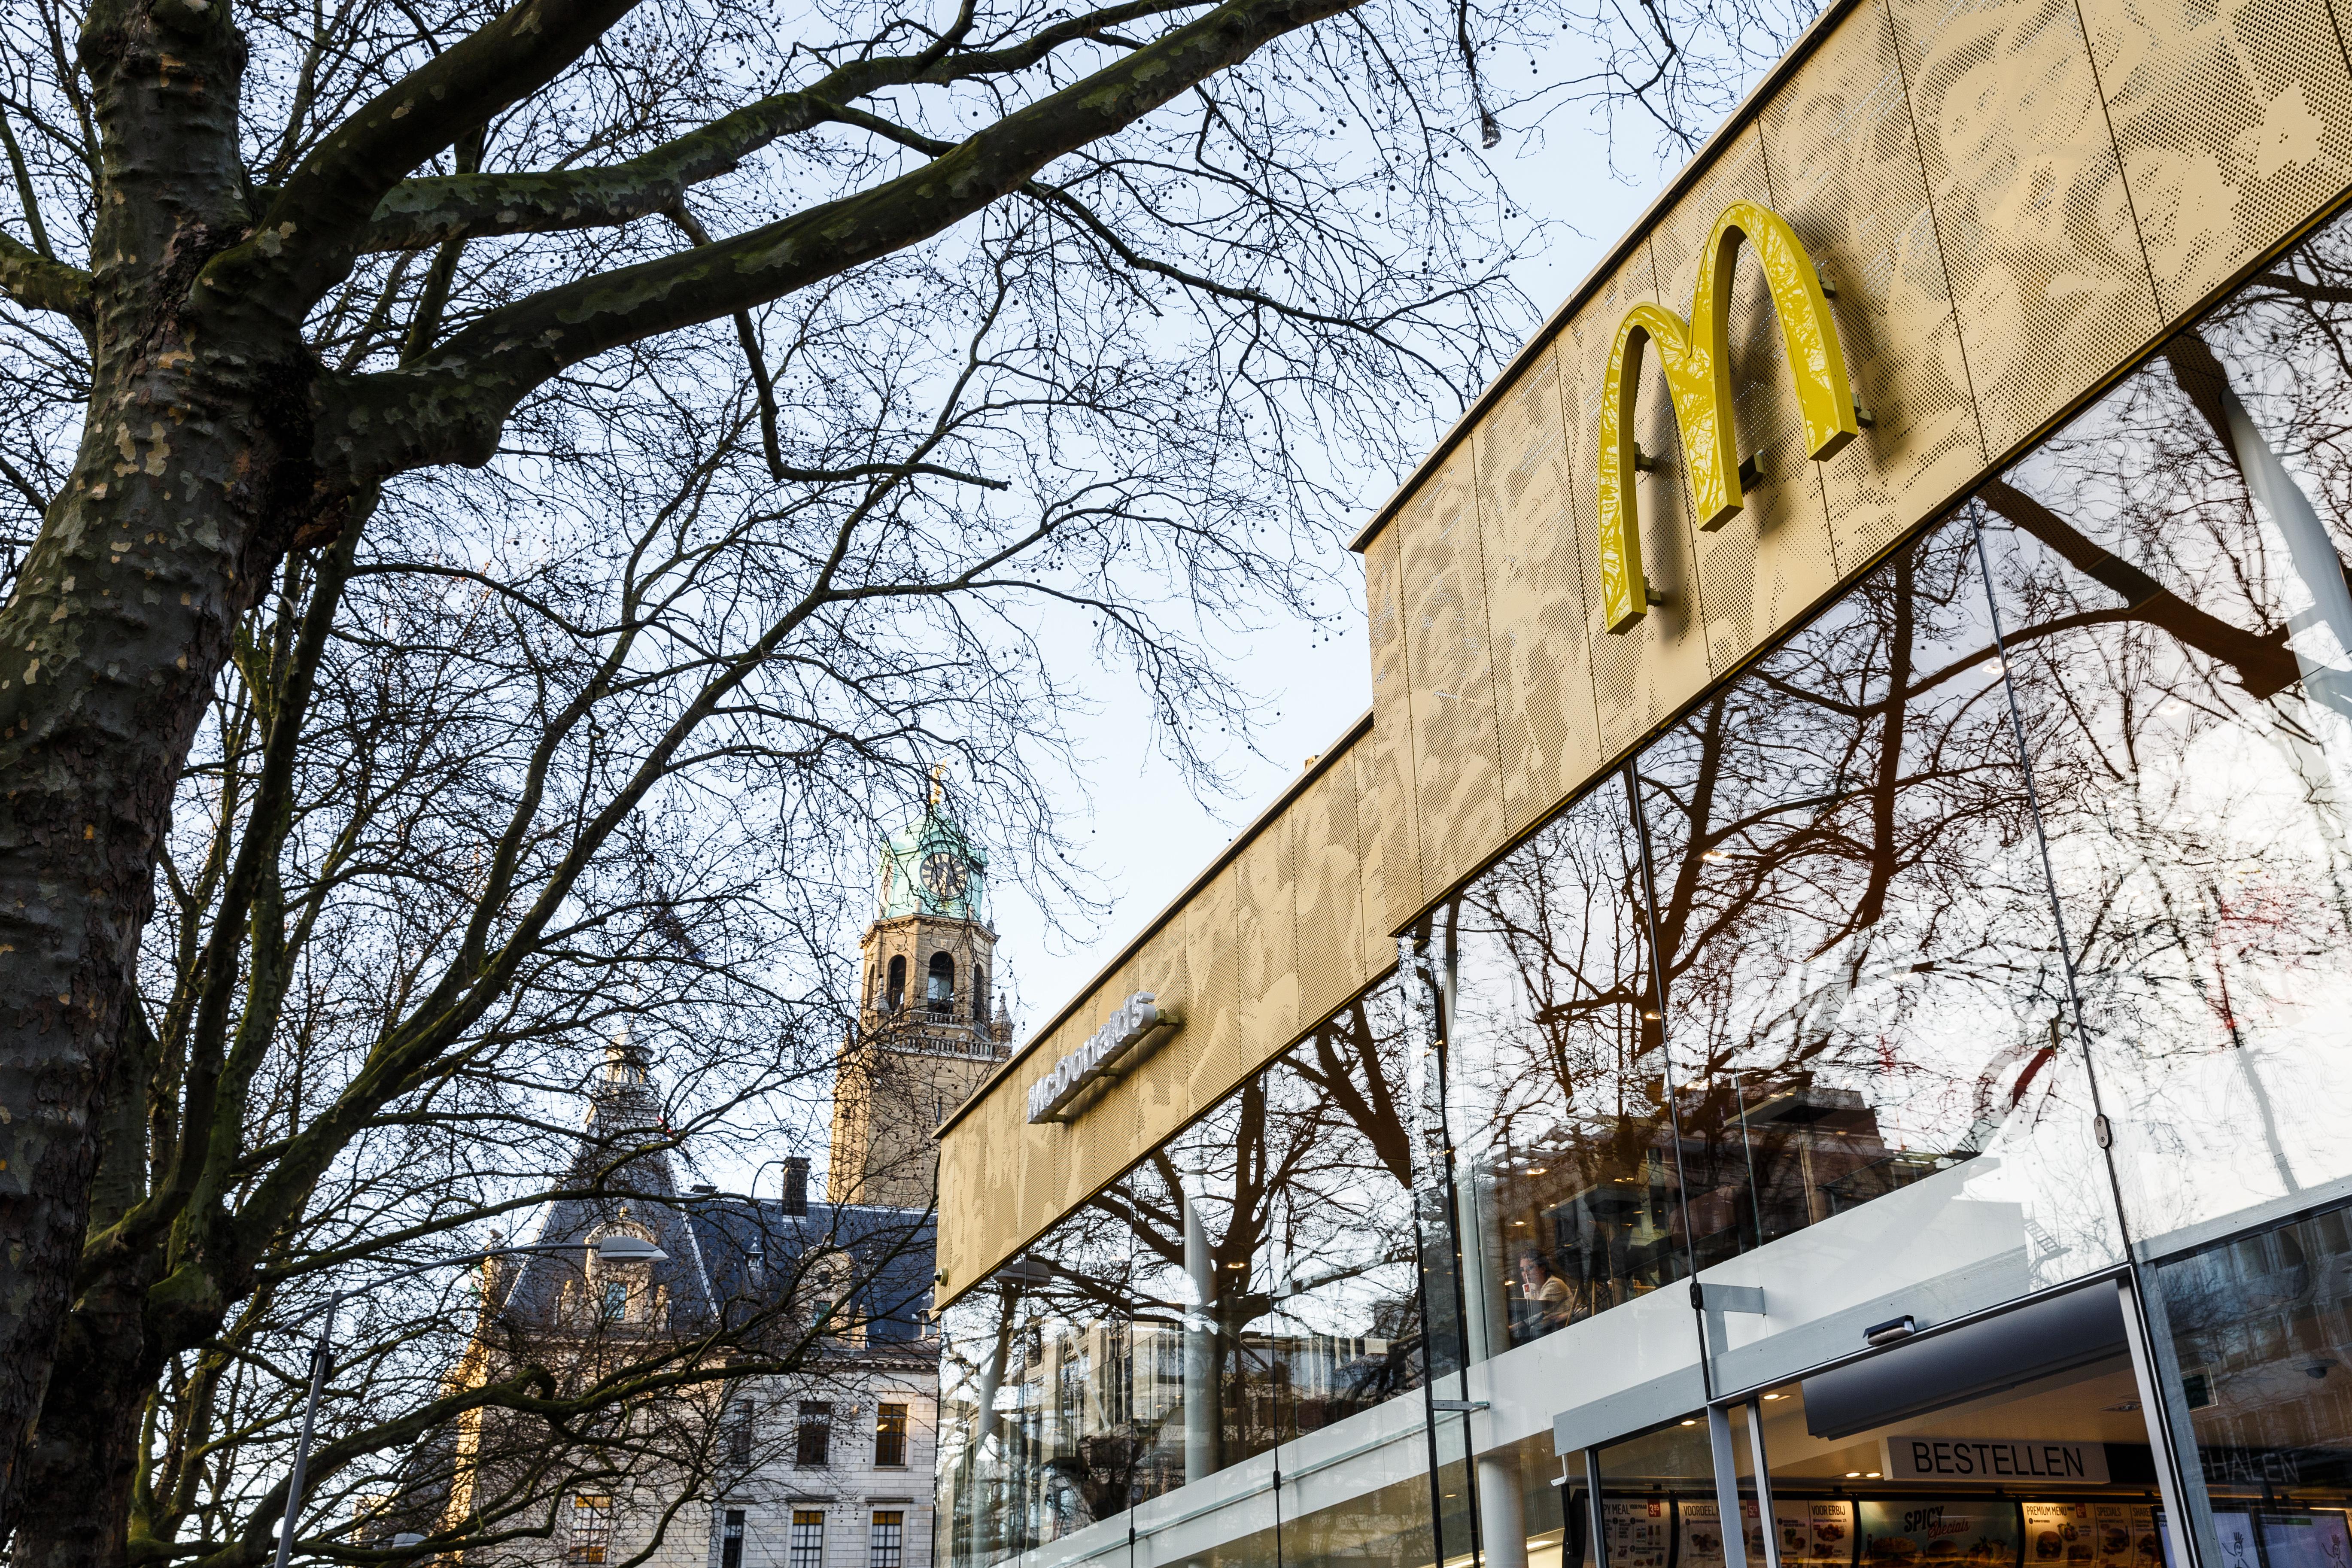 McDonalds Netherlands Exterior